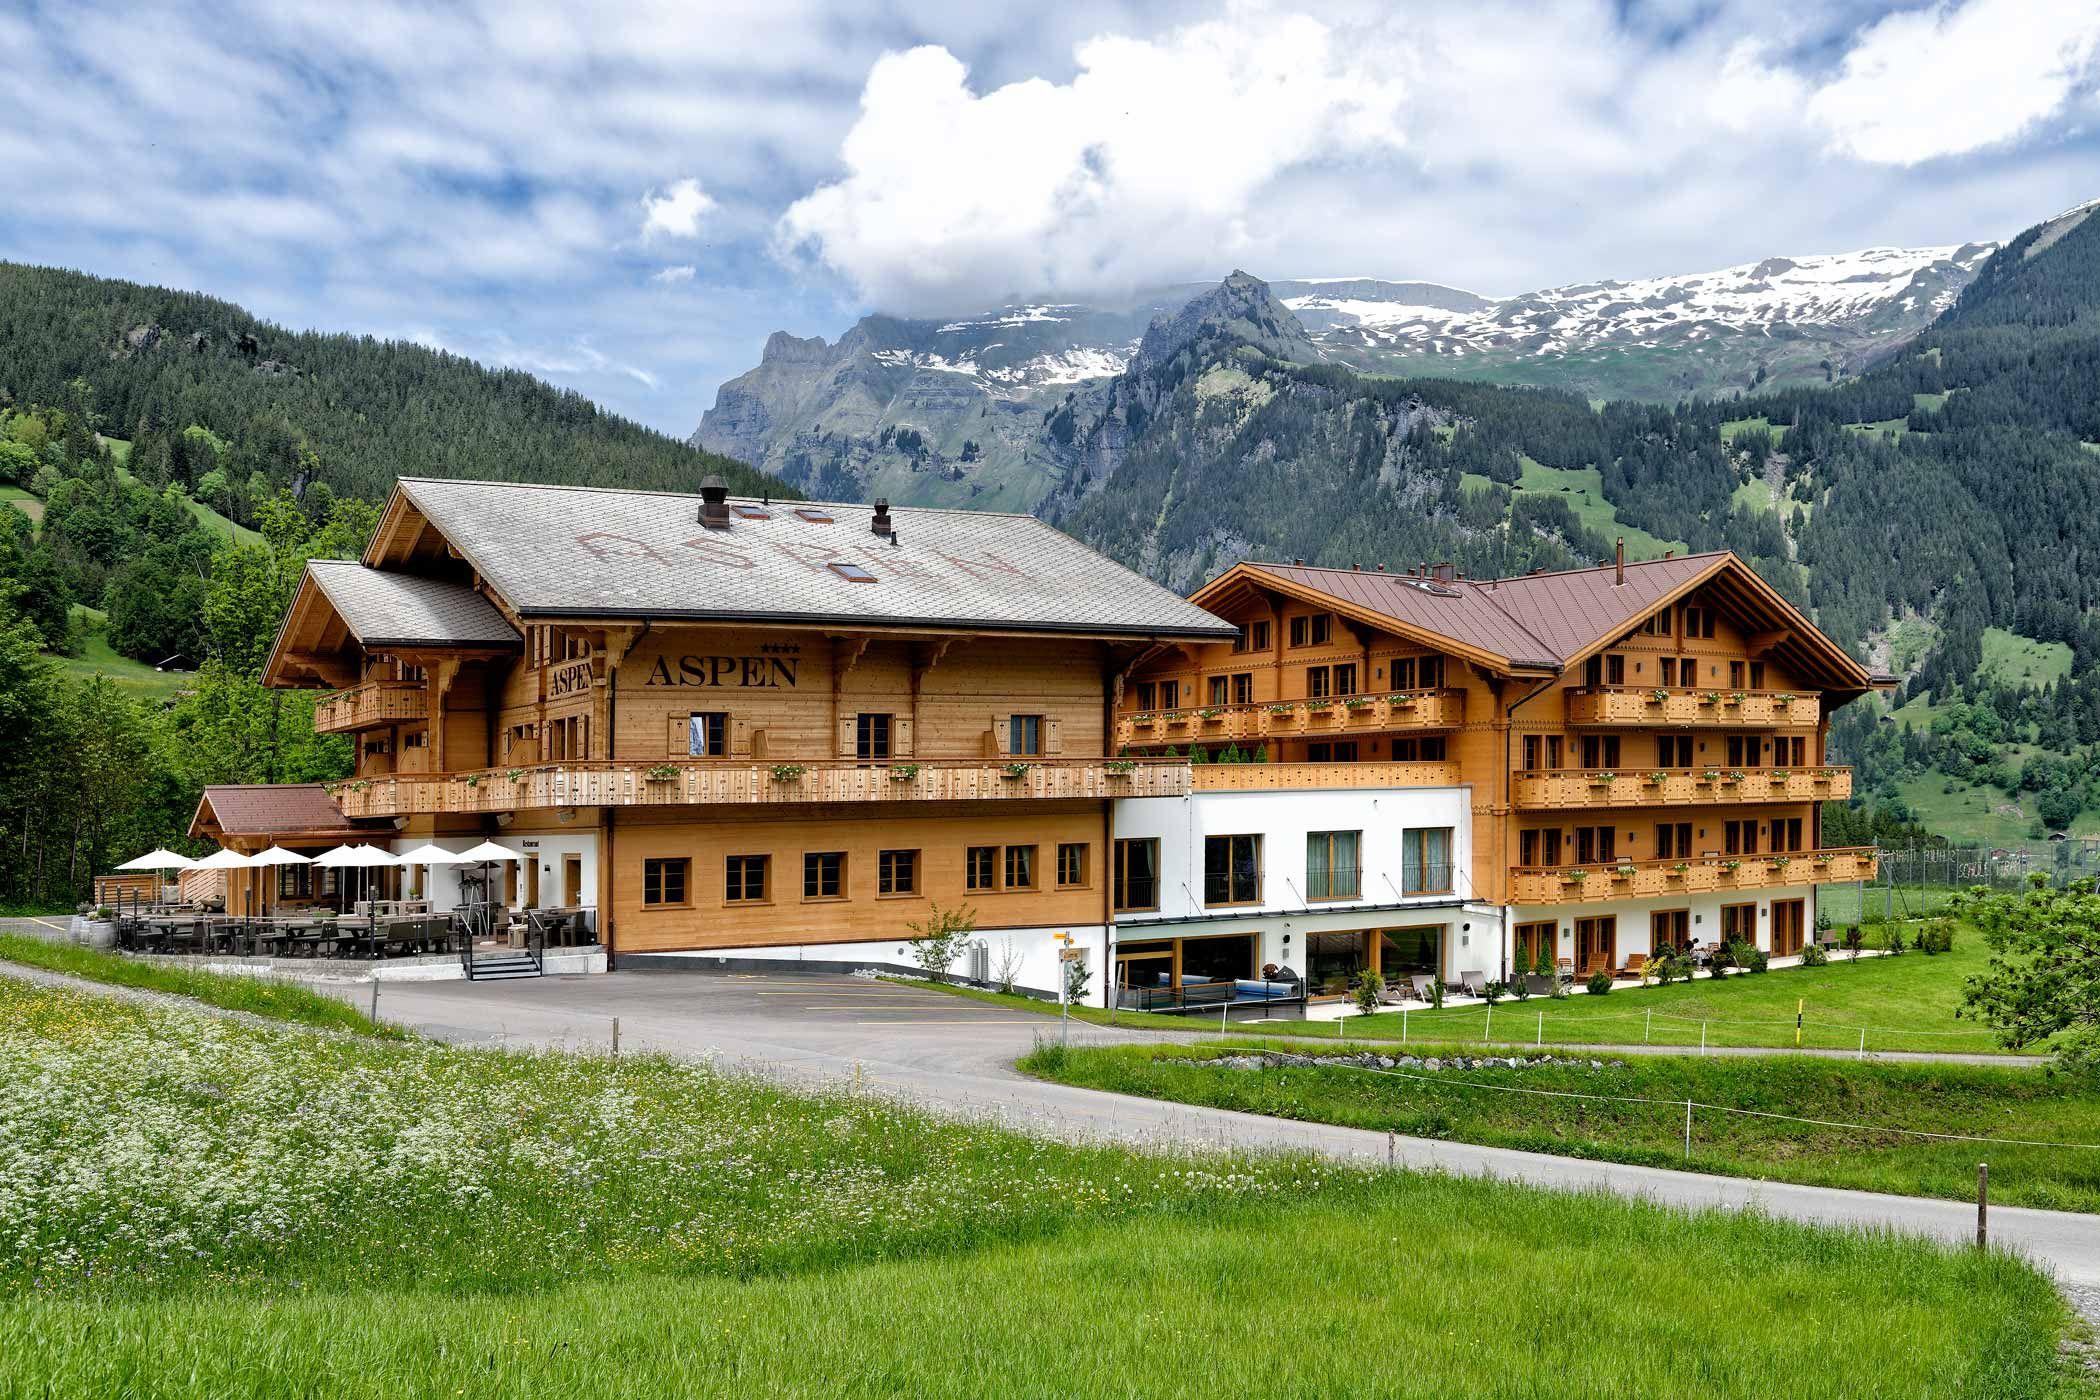 Hotel Aspen Grindelwald Switzerland